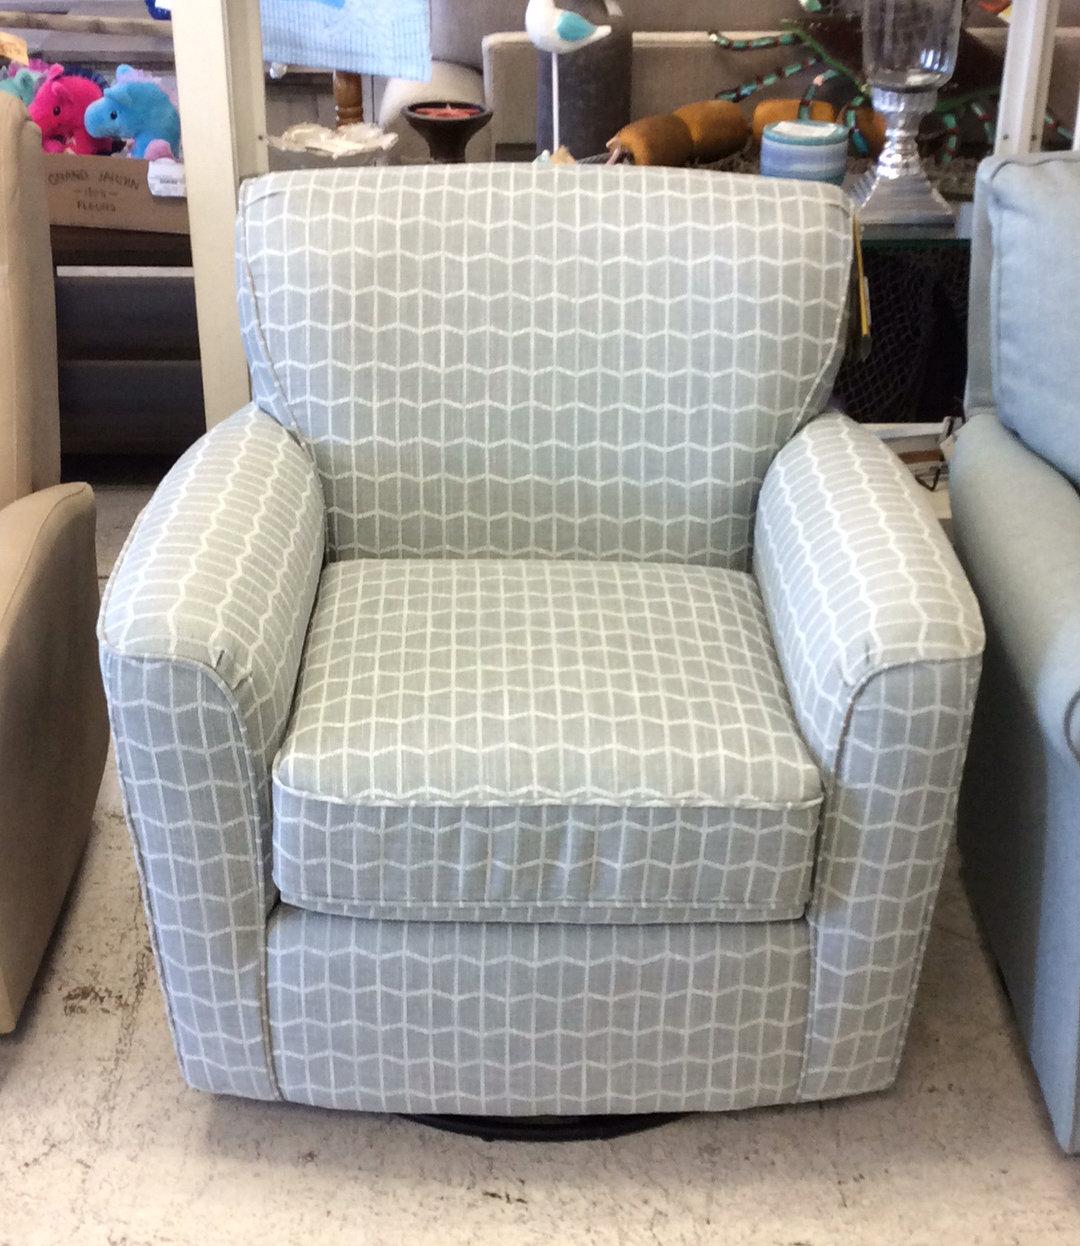 Peachy Kaylee Swivel Glider Machost Co Dining Chair Design Ideas Machostcouk